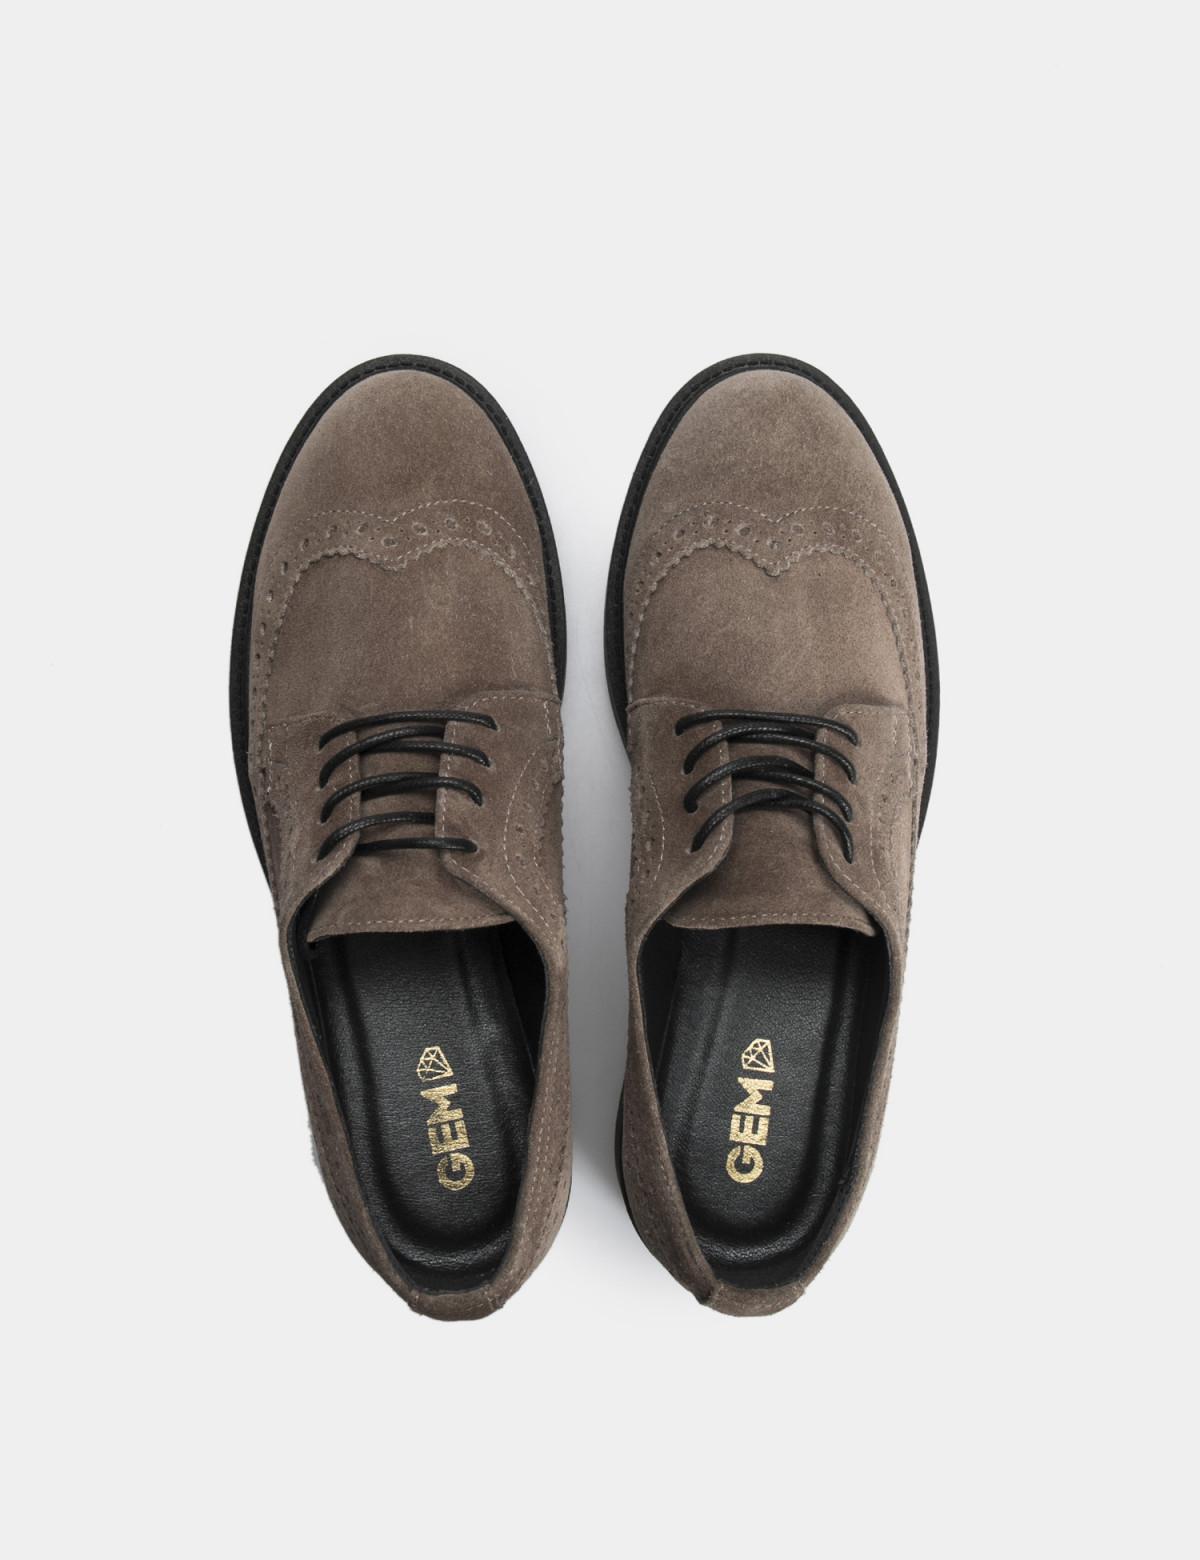 Туфлі темно-бежеві, натуральна замша3